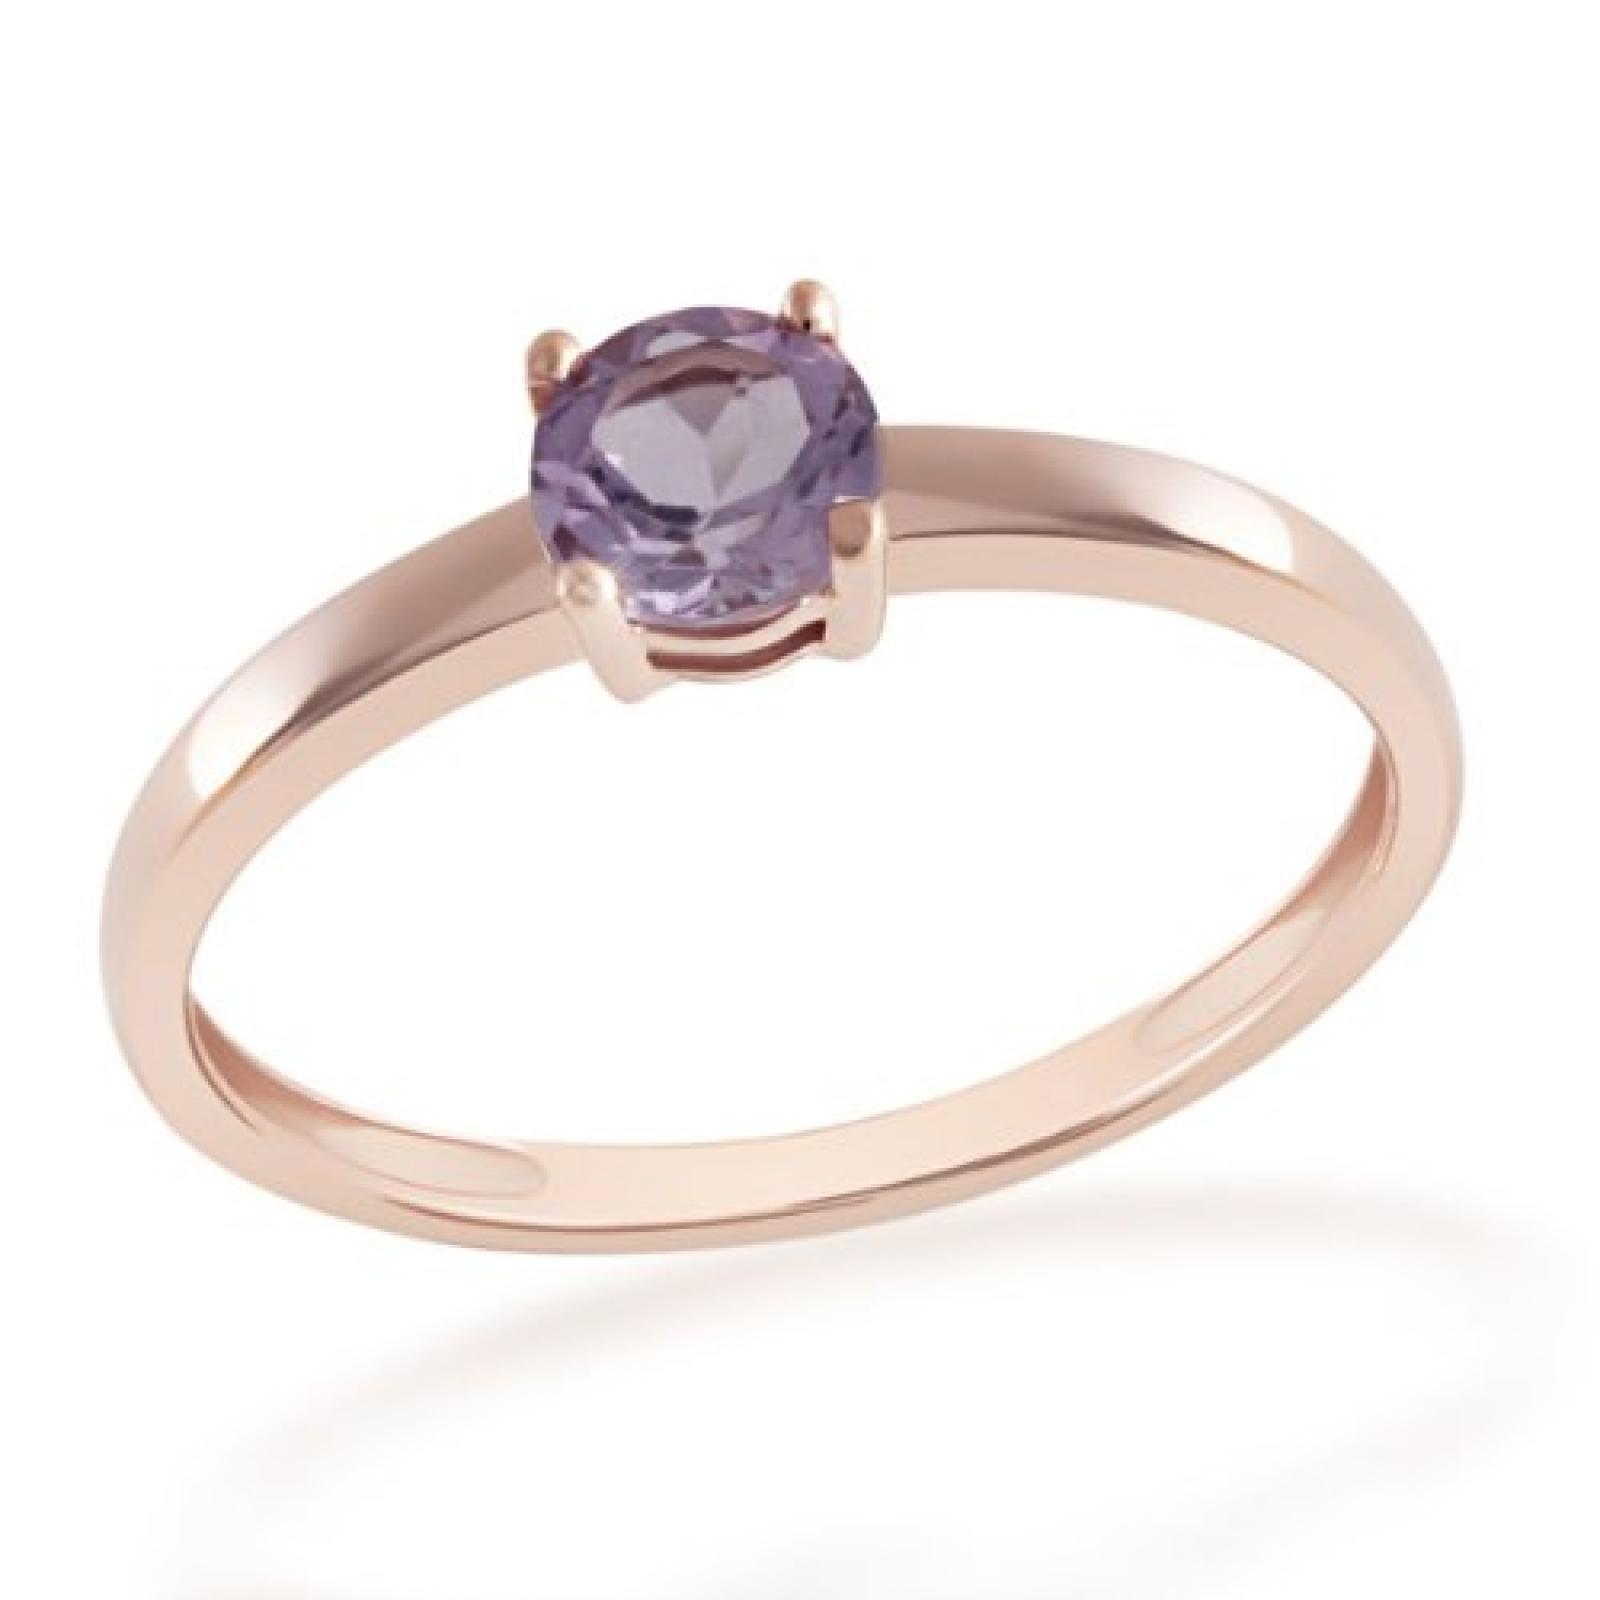 Goldmaid Damen-Ring Summerfeeling 375 Rotgold 1 Amethyst Fa R5756RG